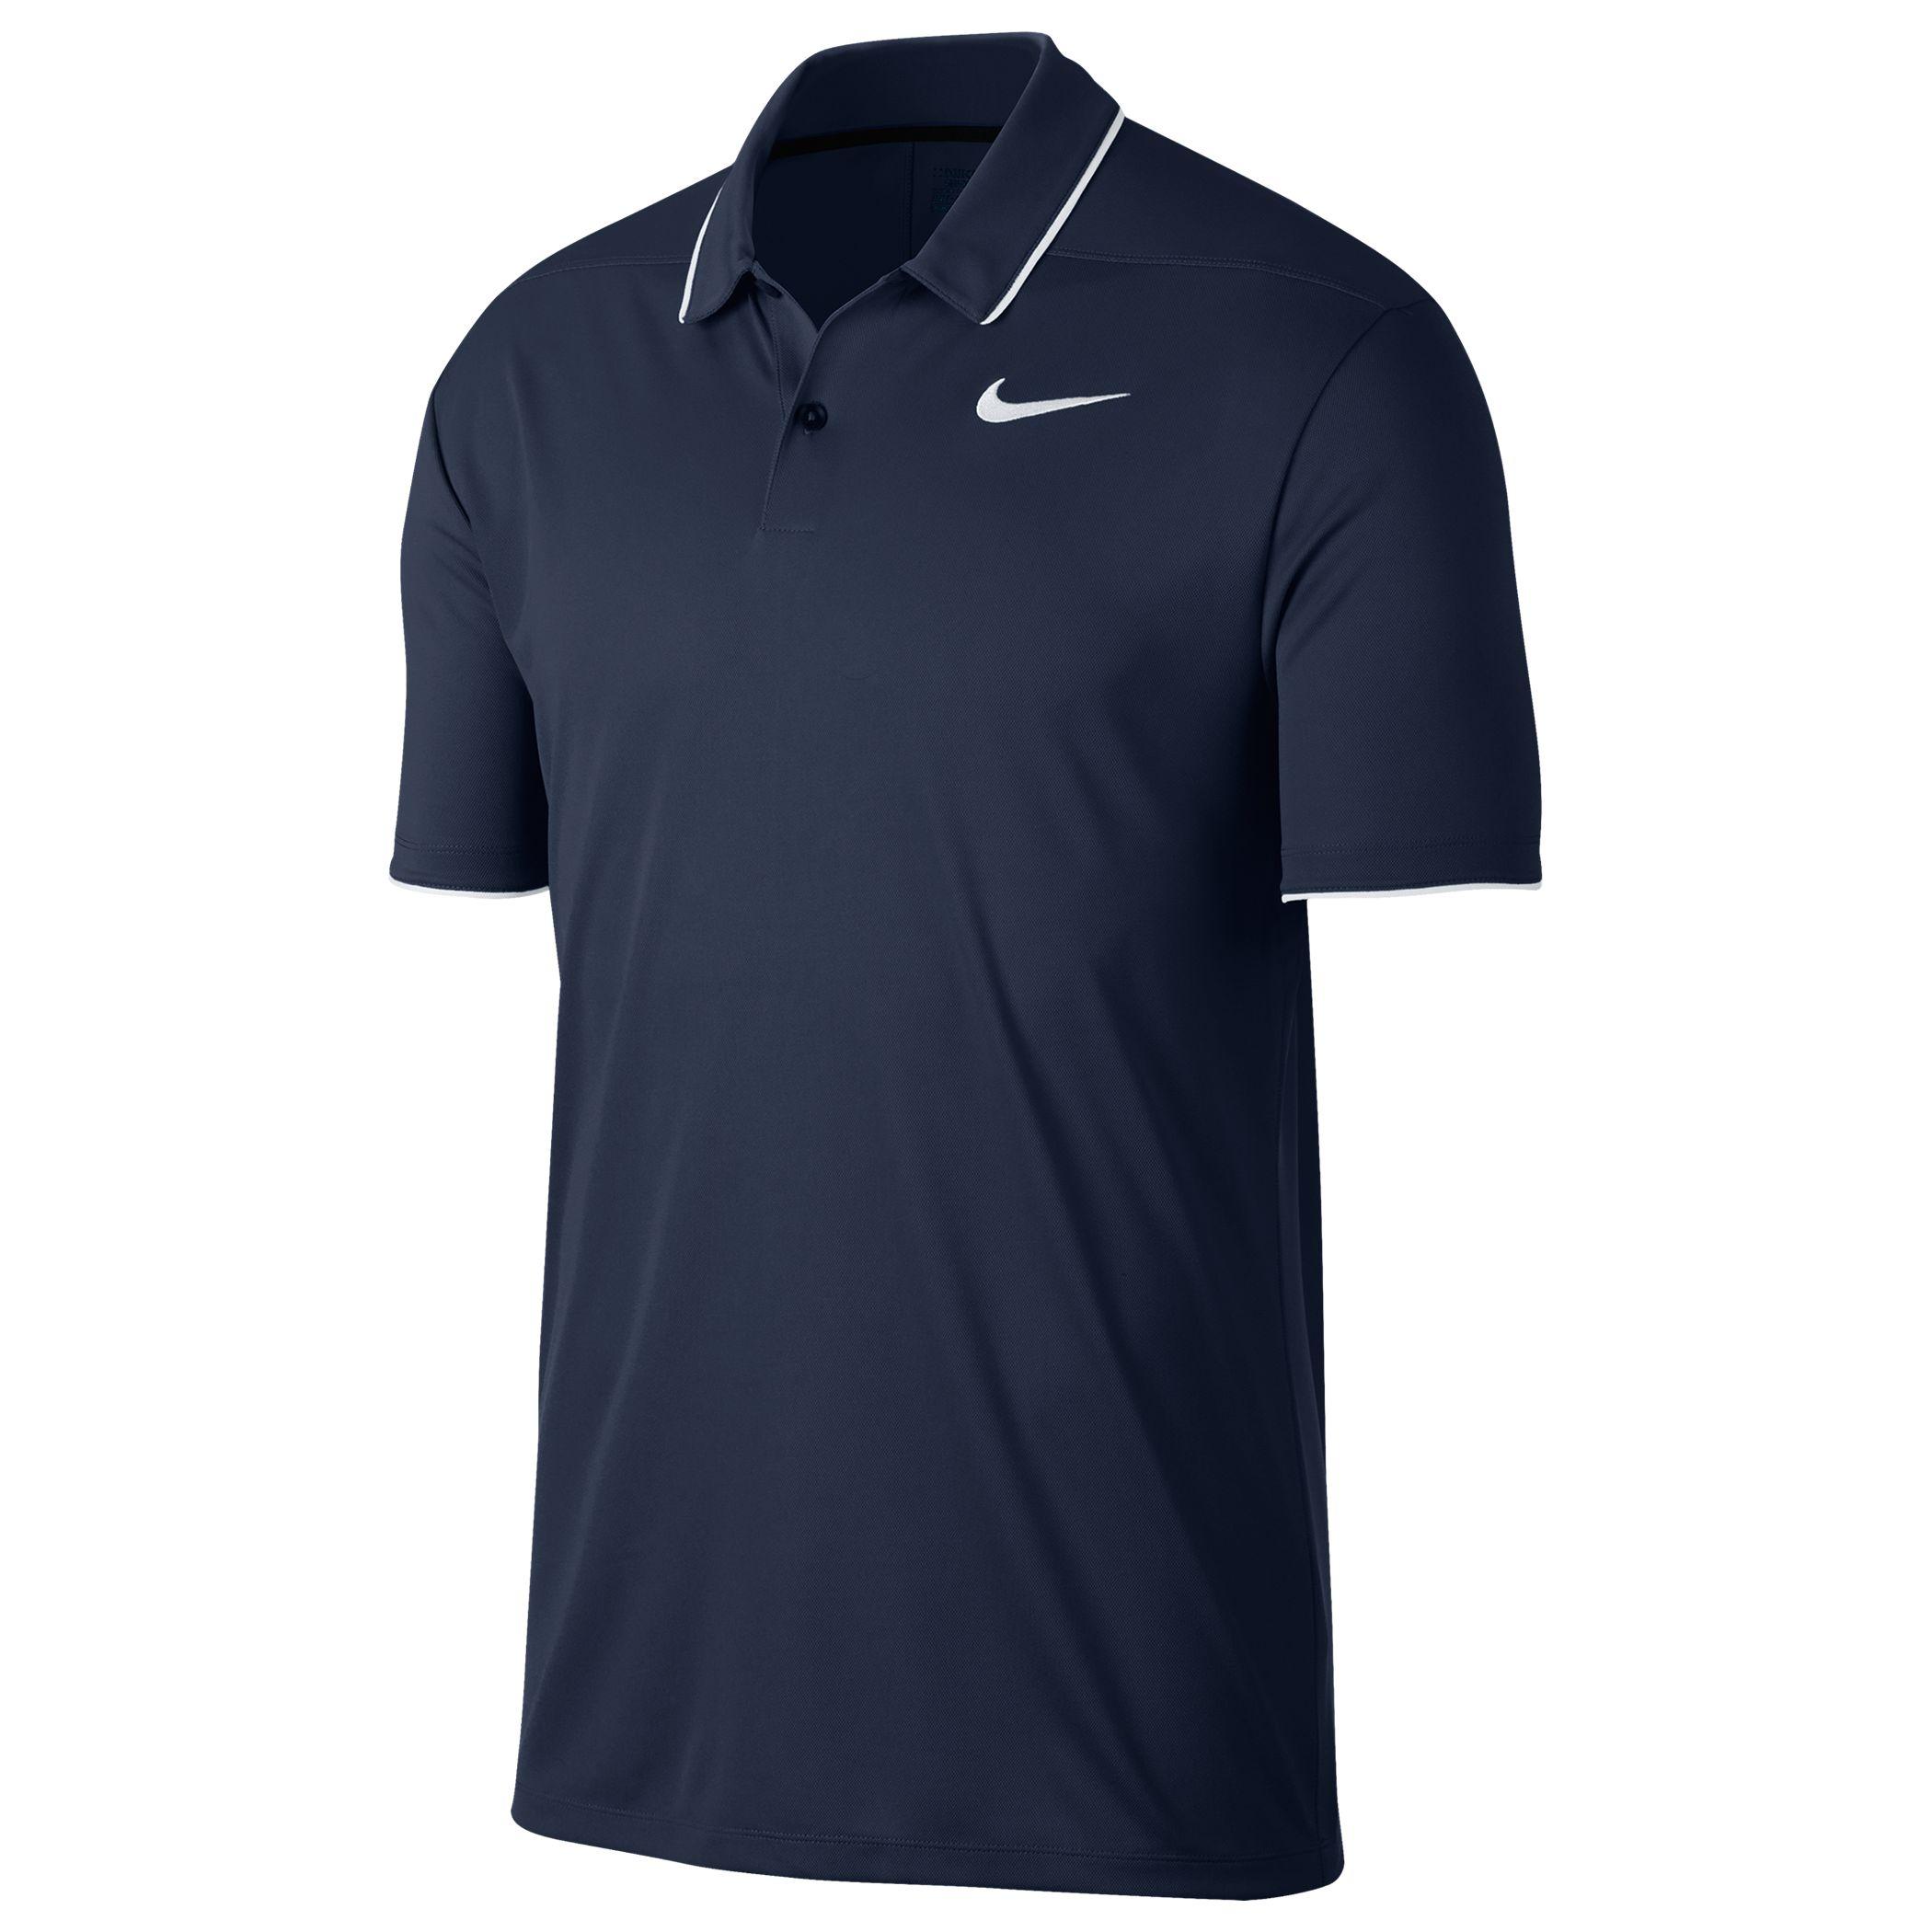 Men\u0027s Nike Essential Regular-Fit Dri-FIT Performance Golf Polo